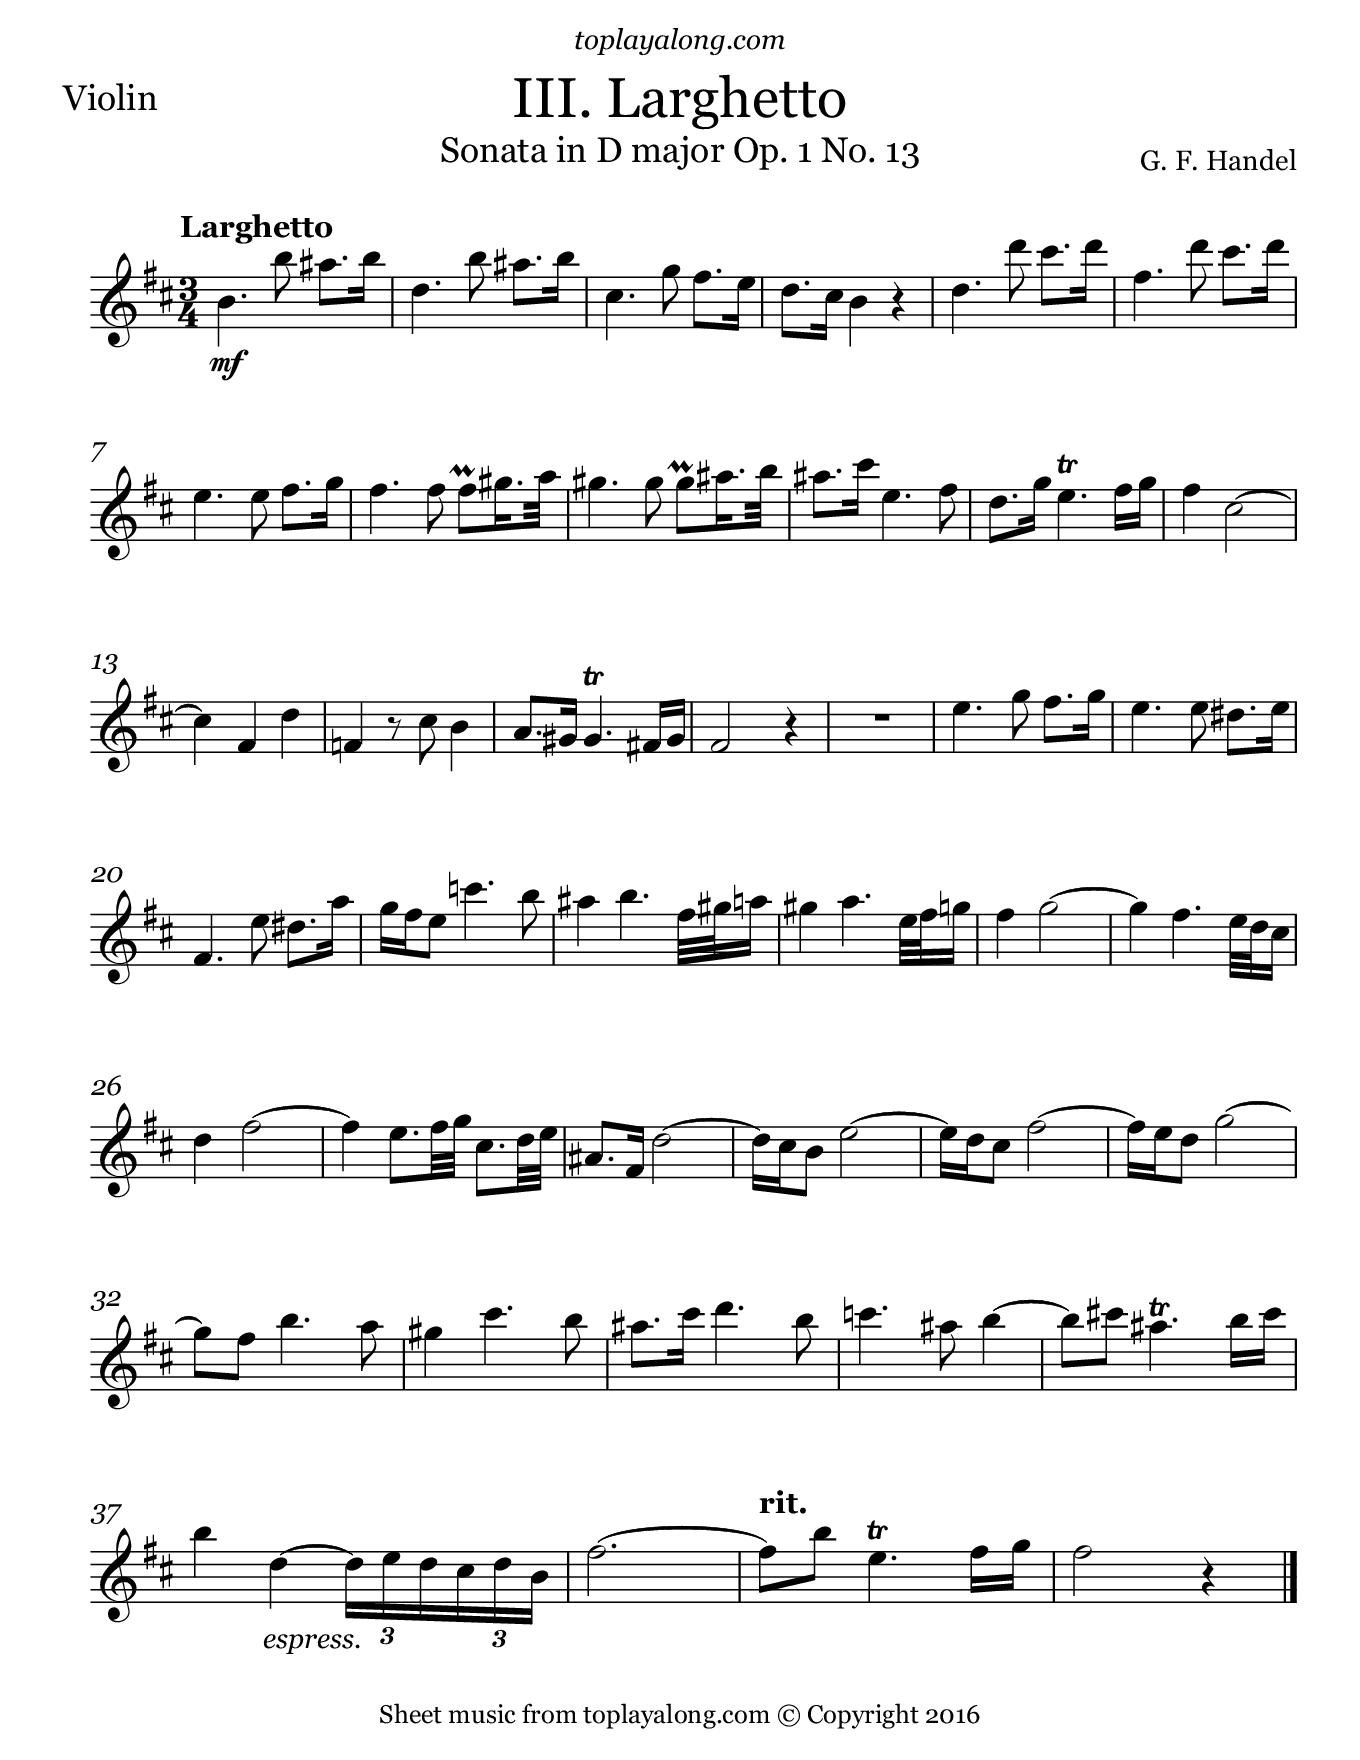 Violin sonata in D major (III. Larghetto) by Handel. Sheet music for Violin, page 1.